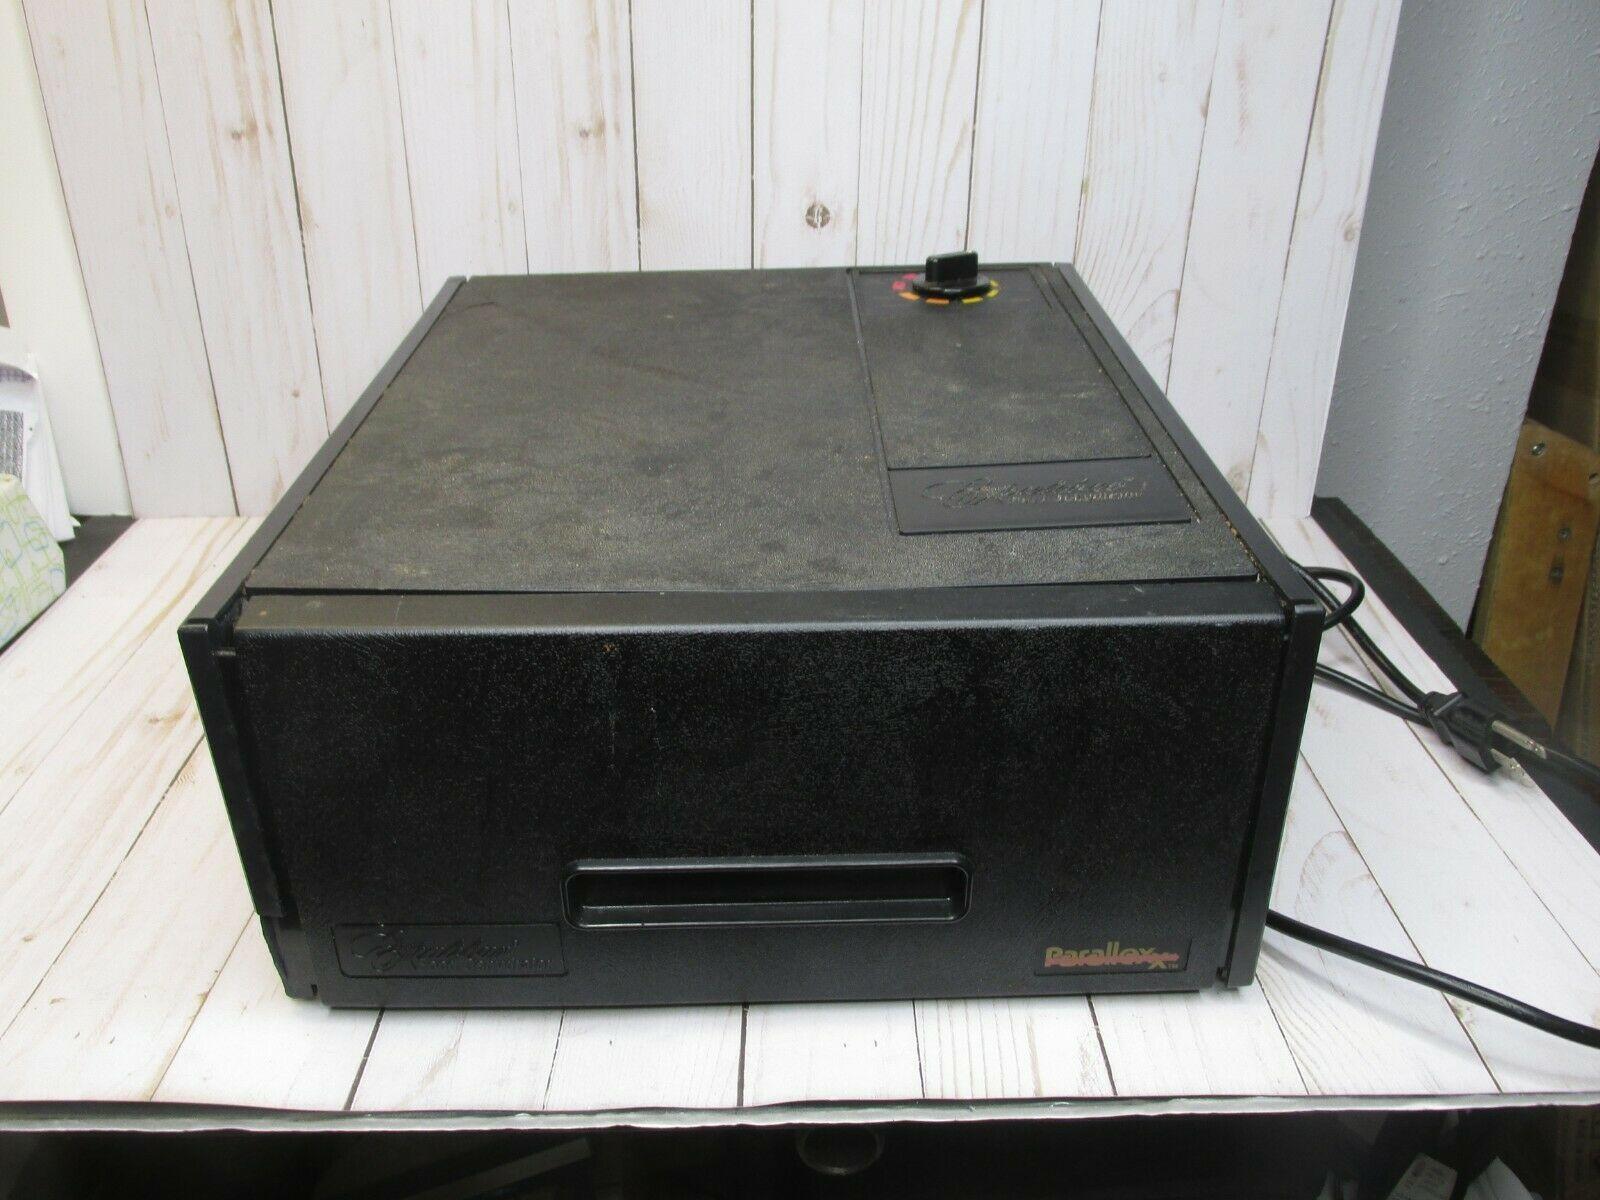 Excalibur Electric Food Dehydrator w/ Thermostat, 4-Tray, Black Cracks in plasti - $84.14